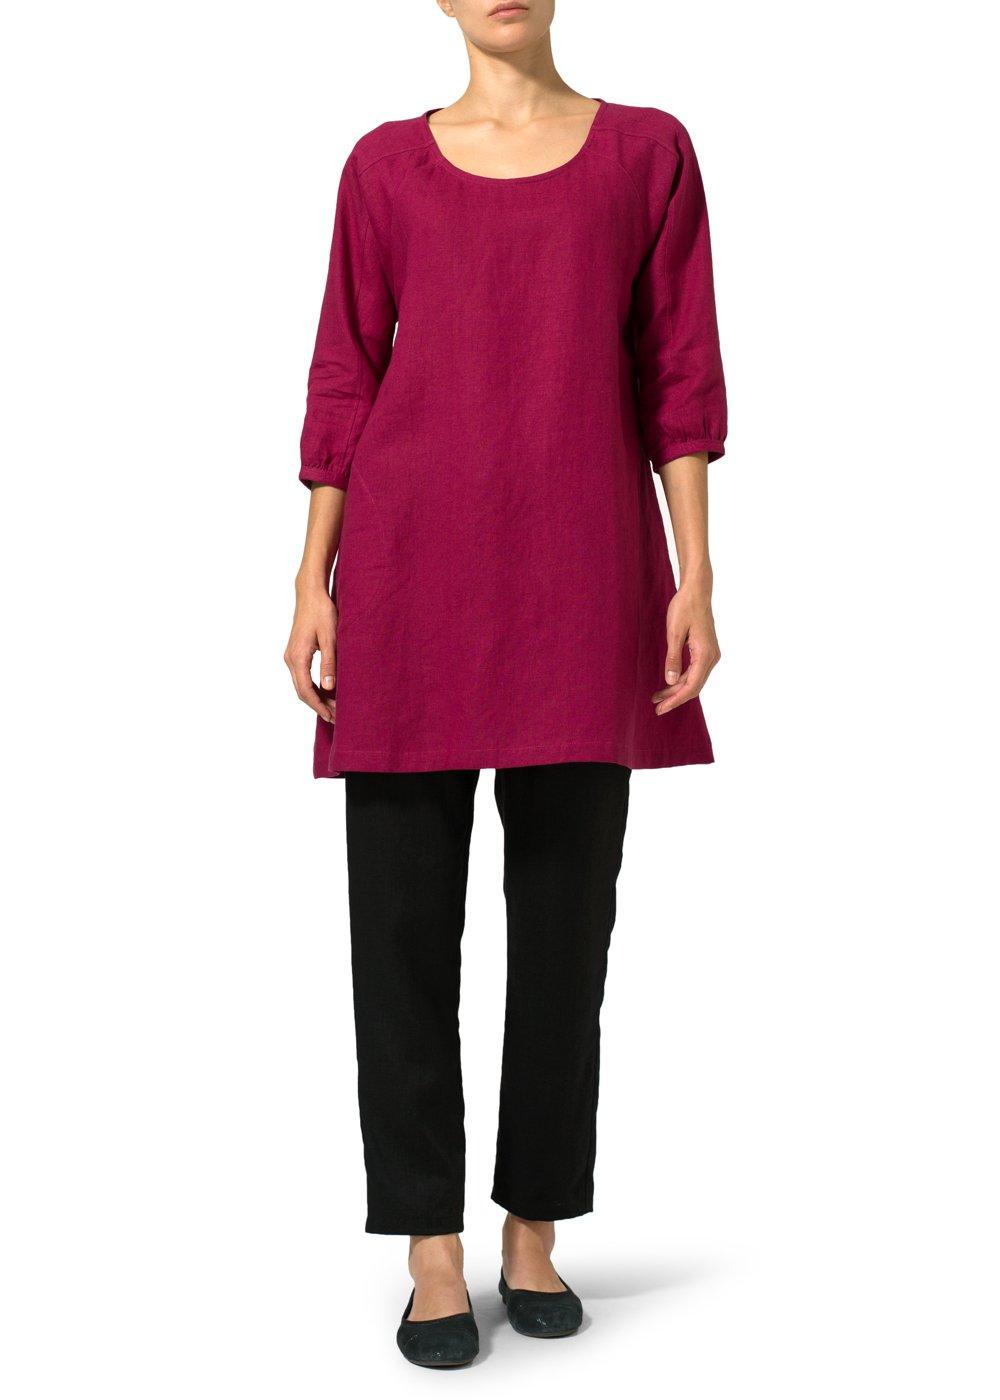 Vivid Linen Elbow Sleeve Tunic-4X-Claret Violet